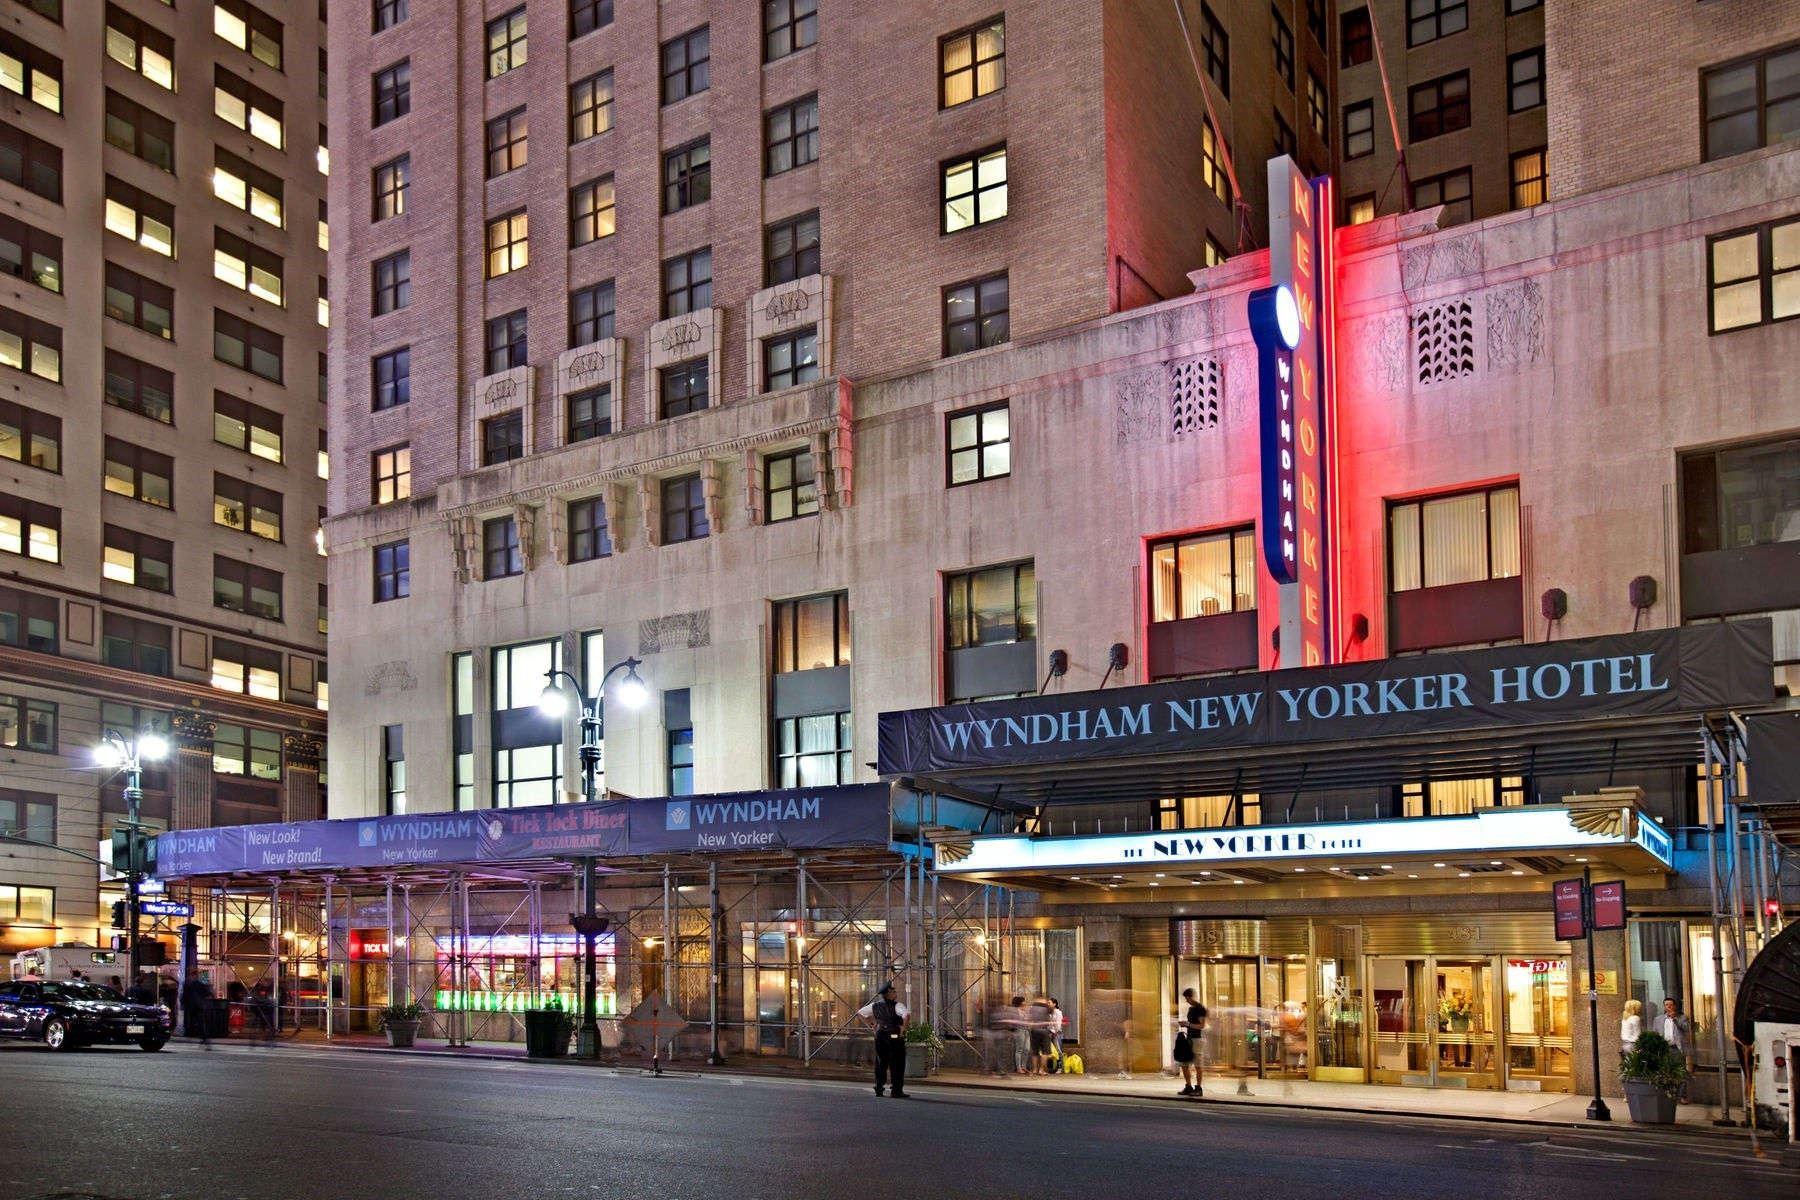 Amadeus Nightclub Aberdeen new york holidays - cheap new york city breaks 2020 / 2021